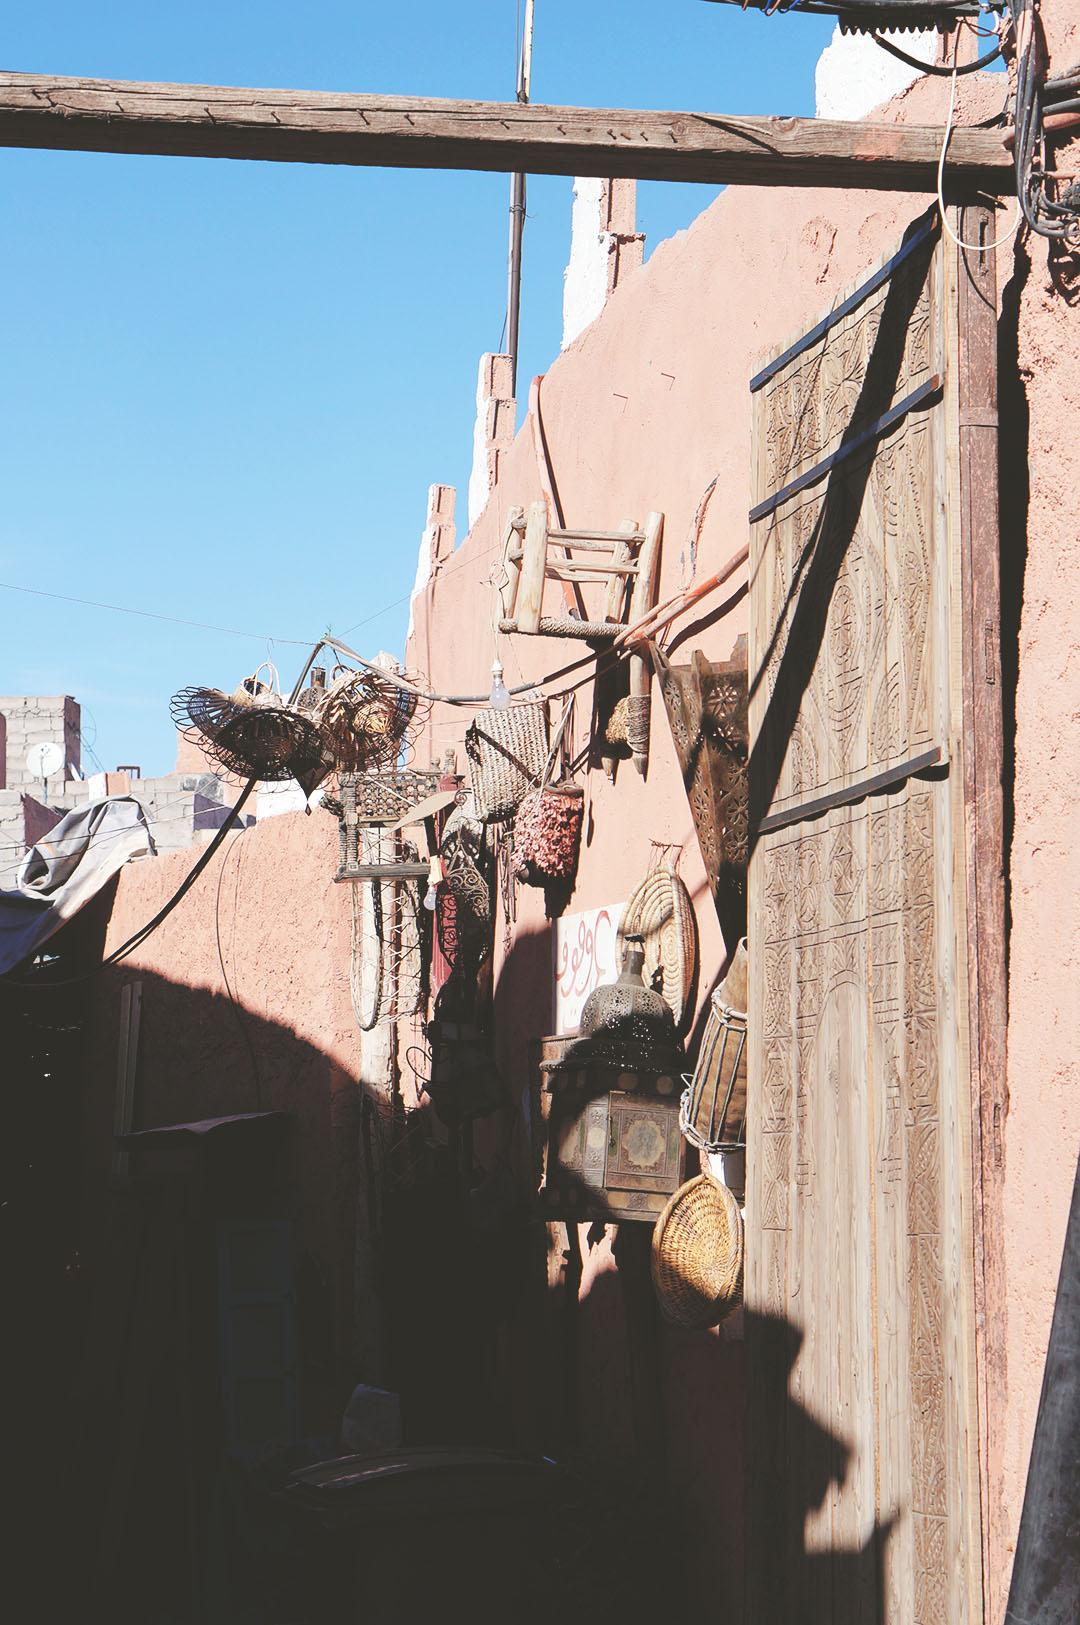 25_24h_marrakech_que_faire